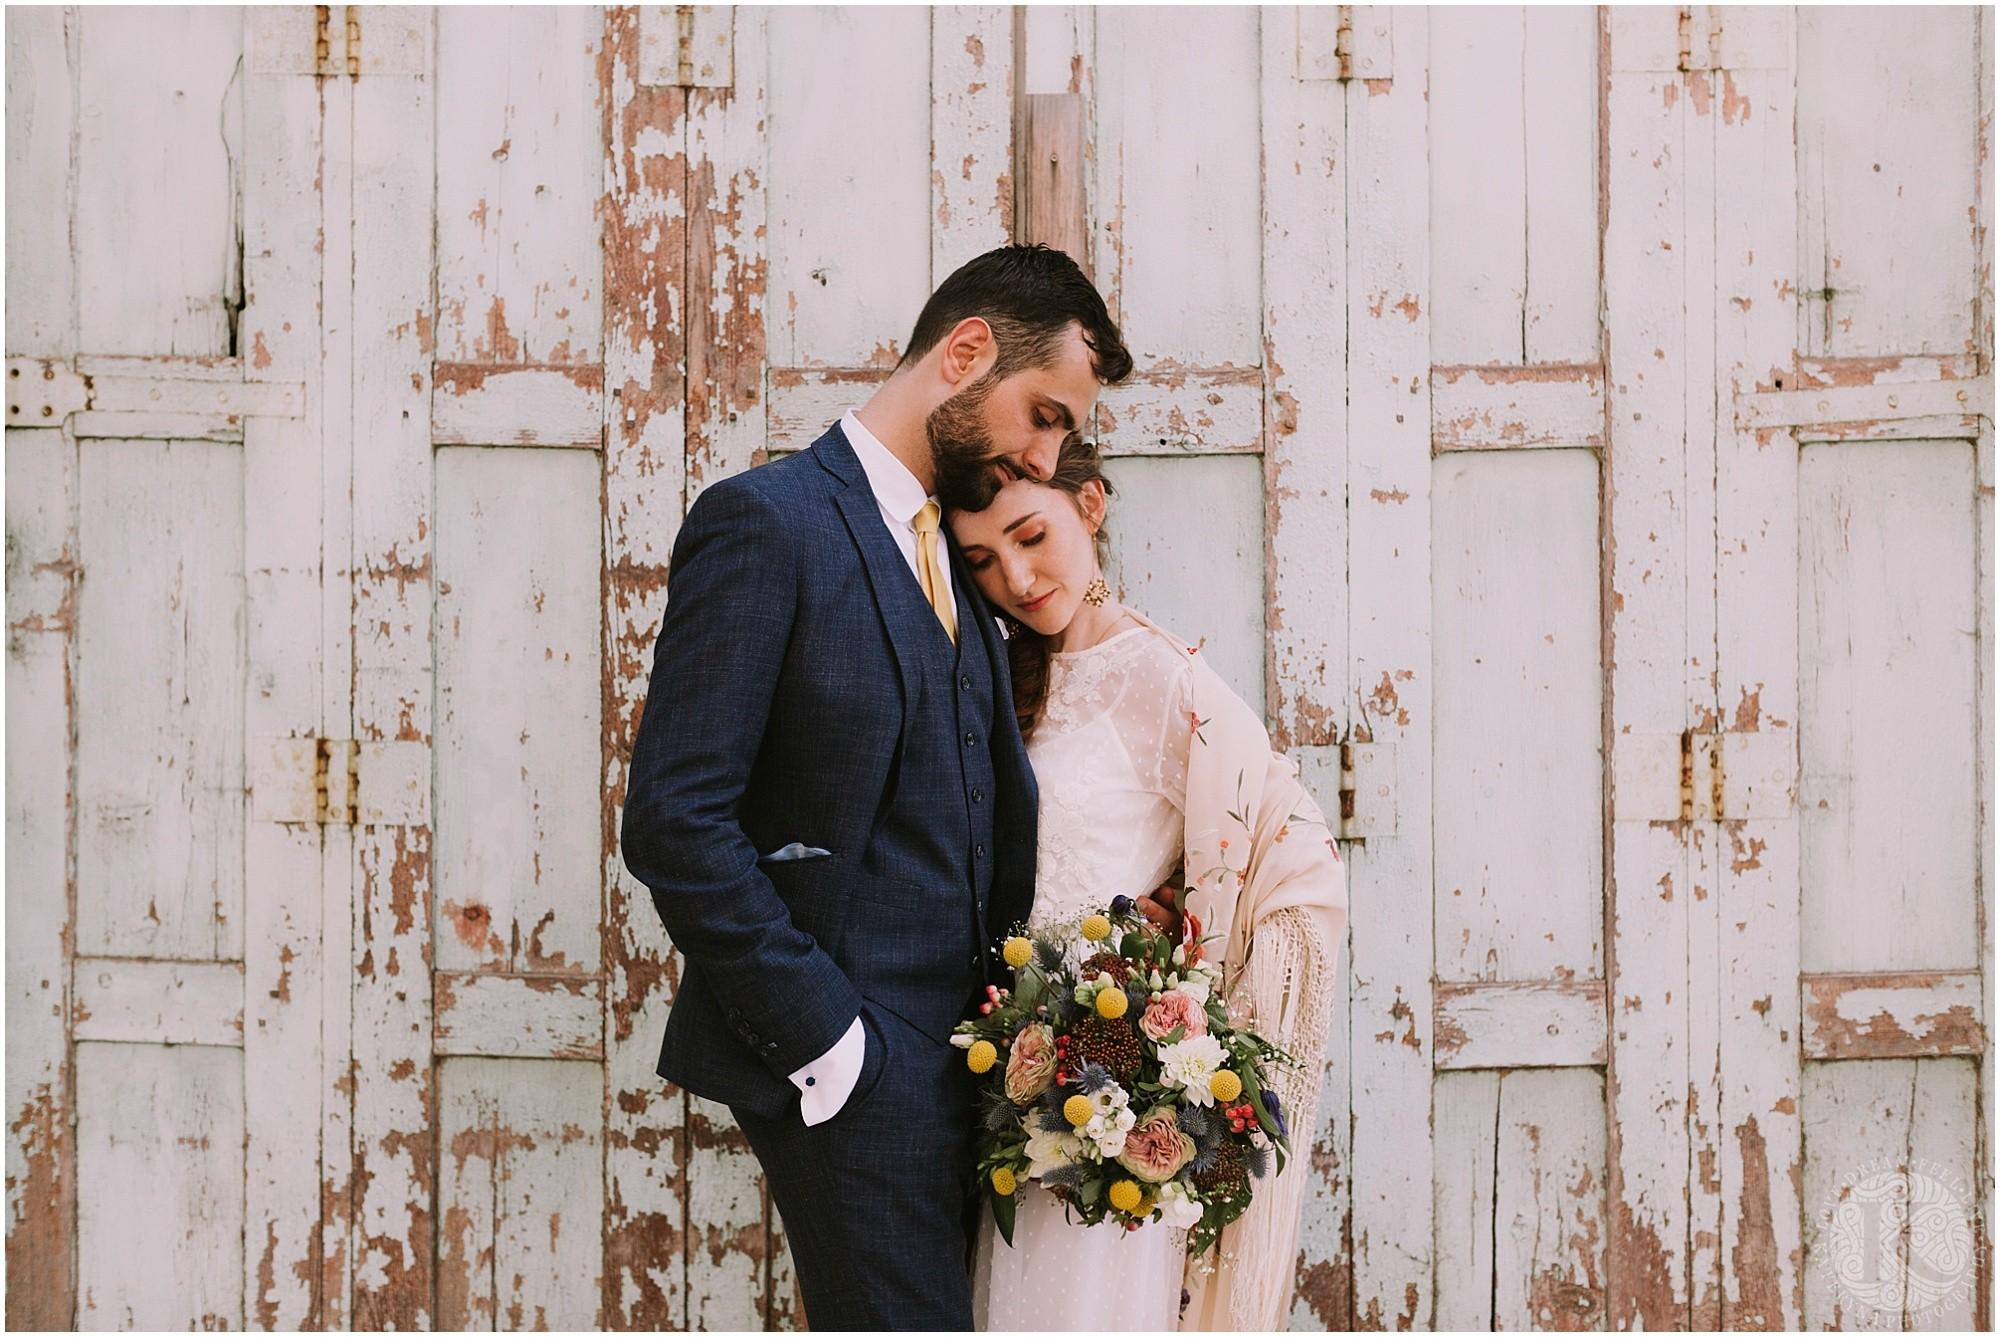 Kateryna-photos-photographe-mariage-vaucluse-provence-avignon-ferme-st-hugues_0054.jpg